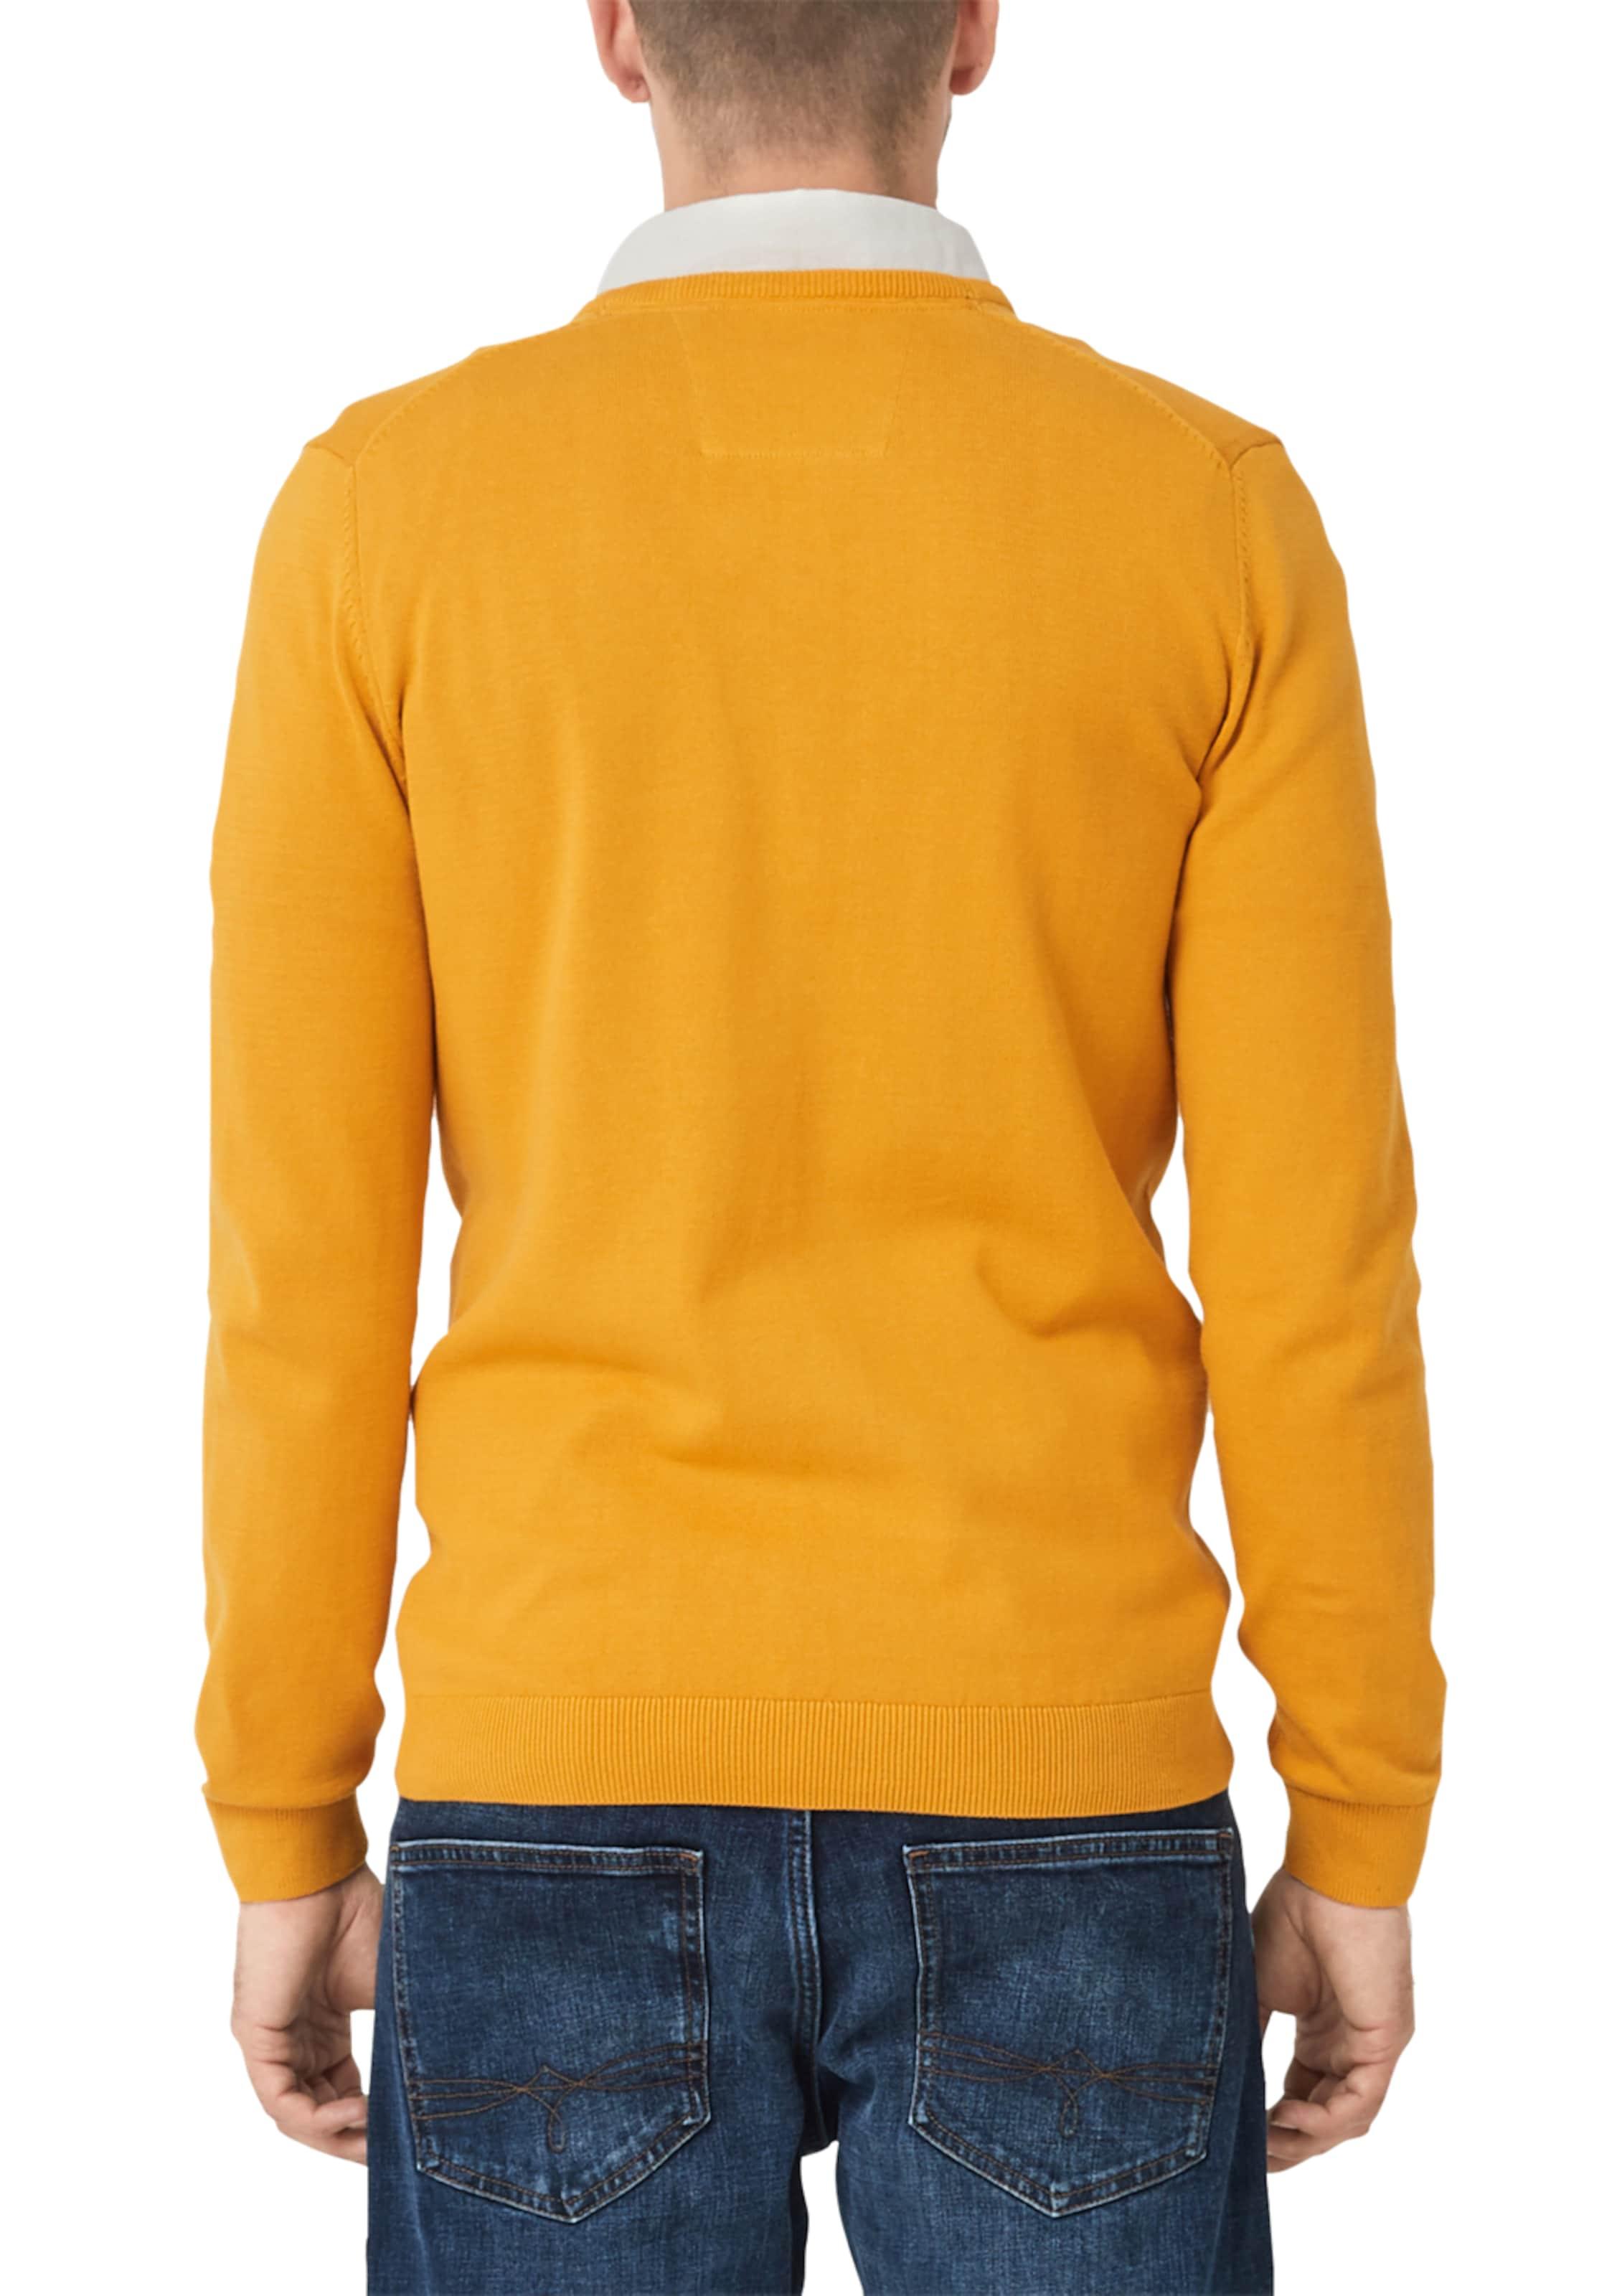 Mit oliver In S Senf Red Pullover Label ausschnitt V m8v0nONw